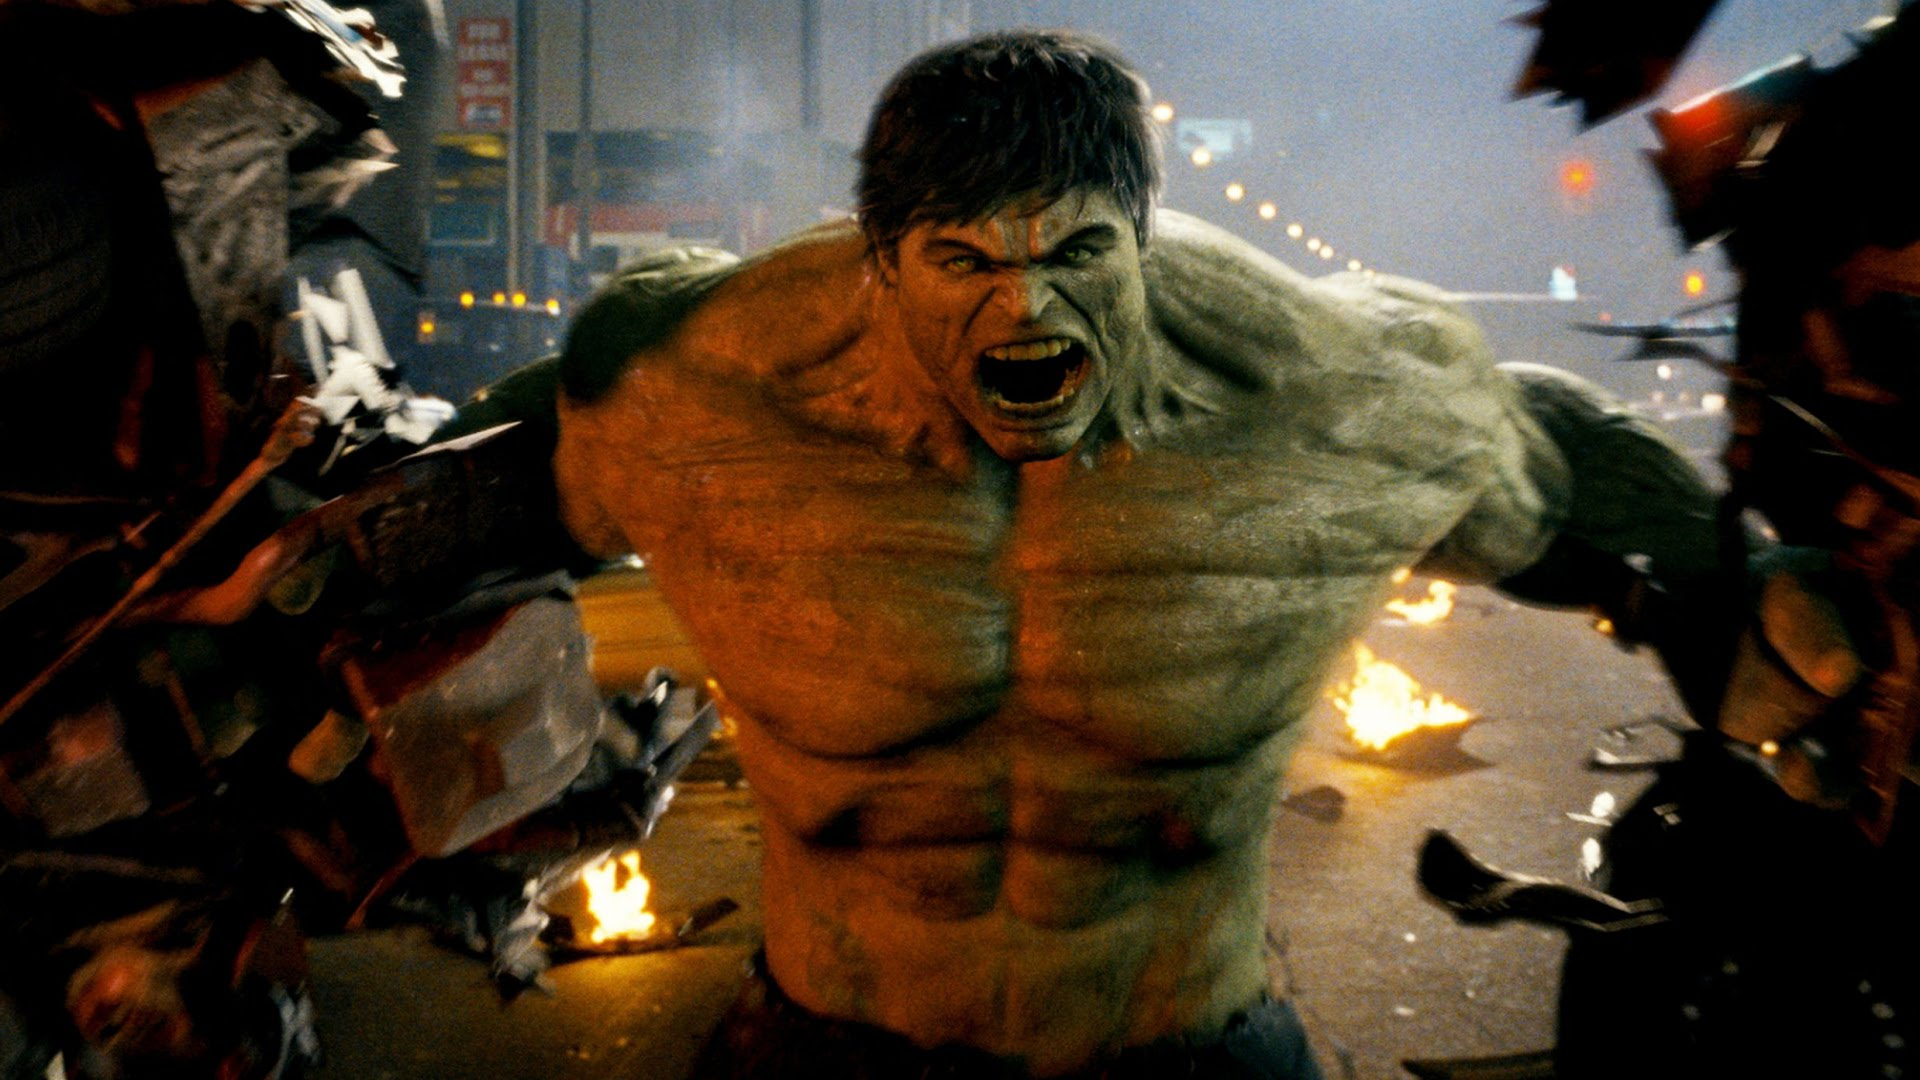 Edward Norton Calls Out Marvel For Bad Incredible Hulk Script